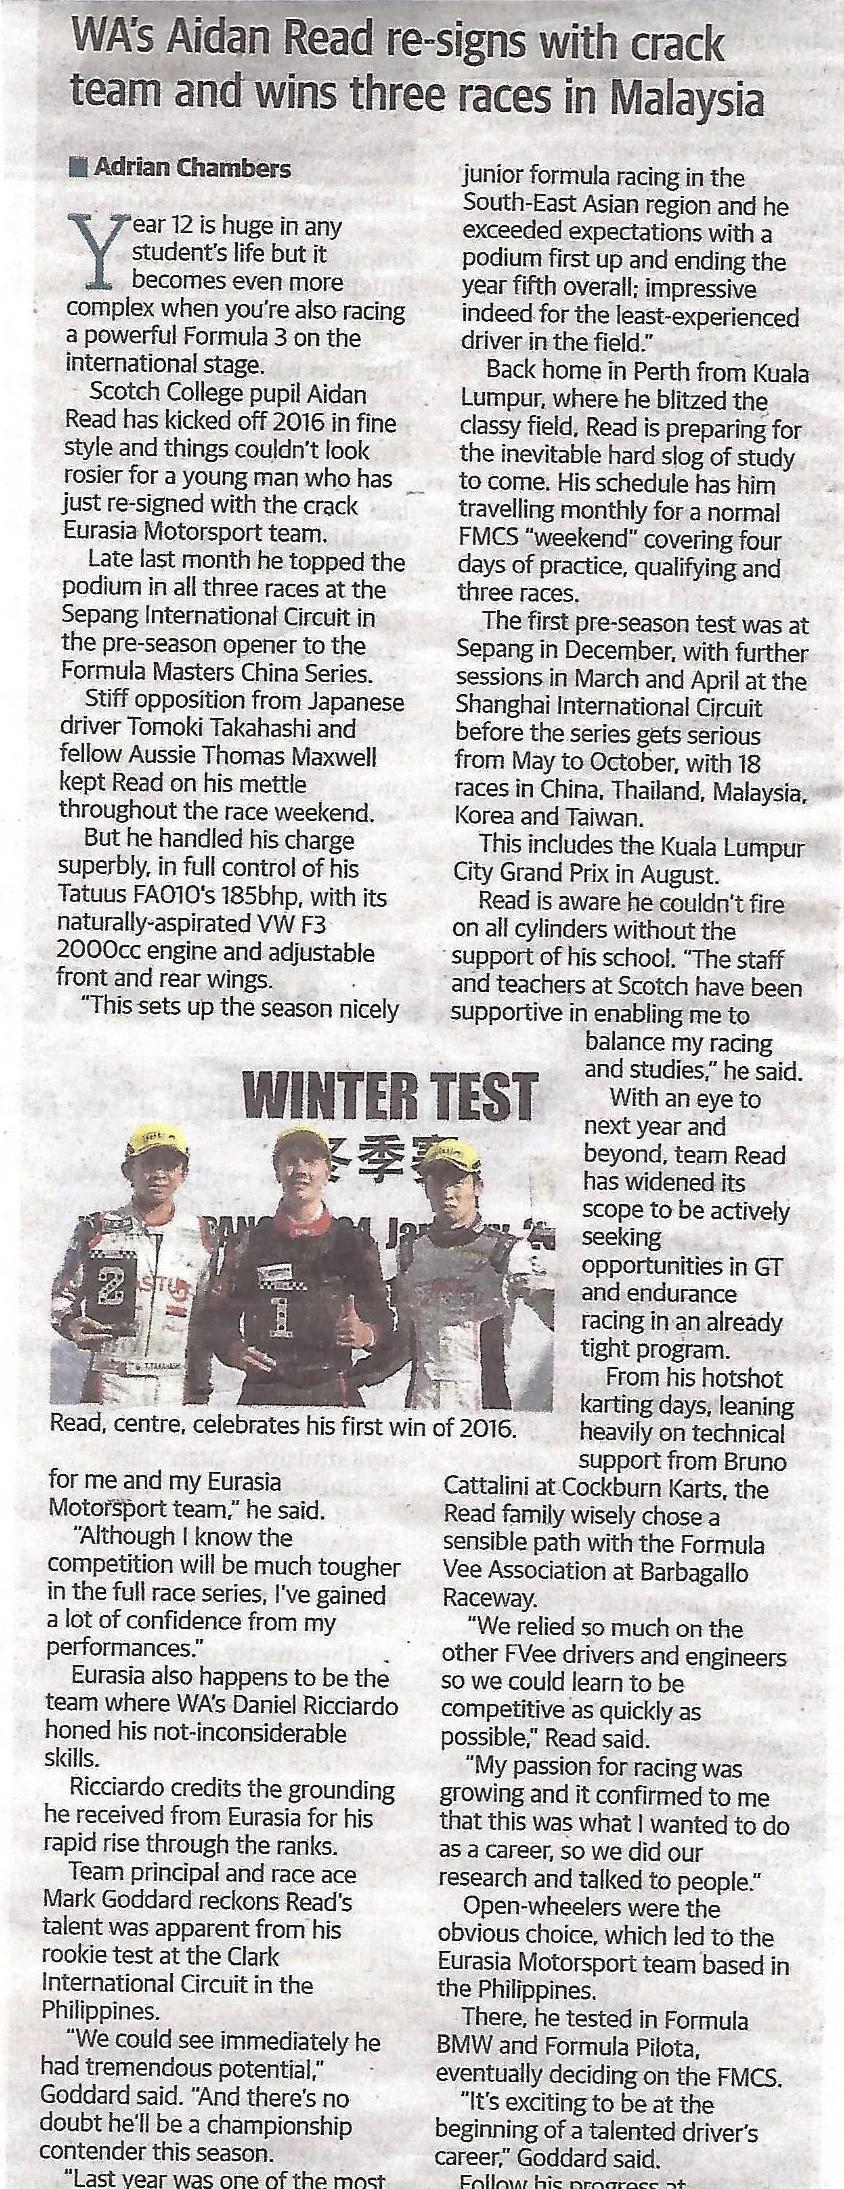 West Australian Newspaper Insert